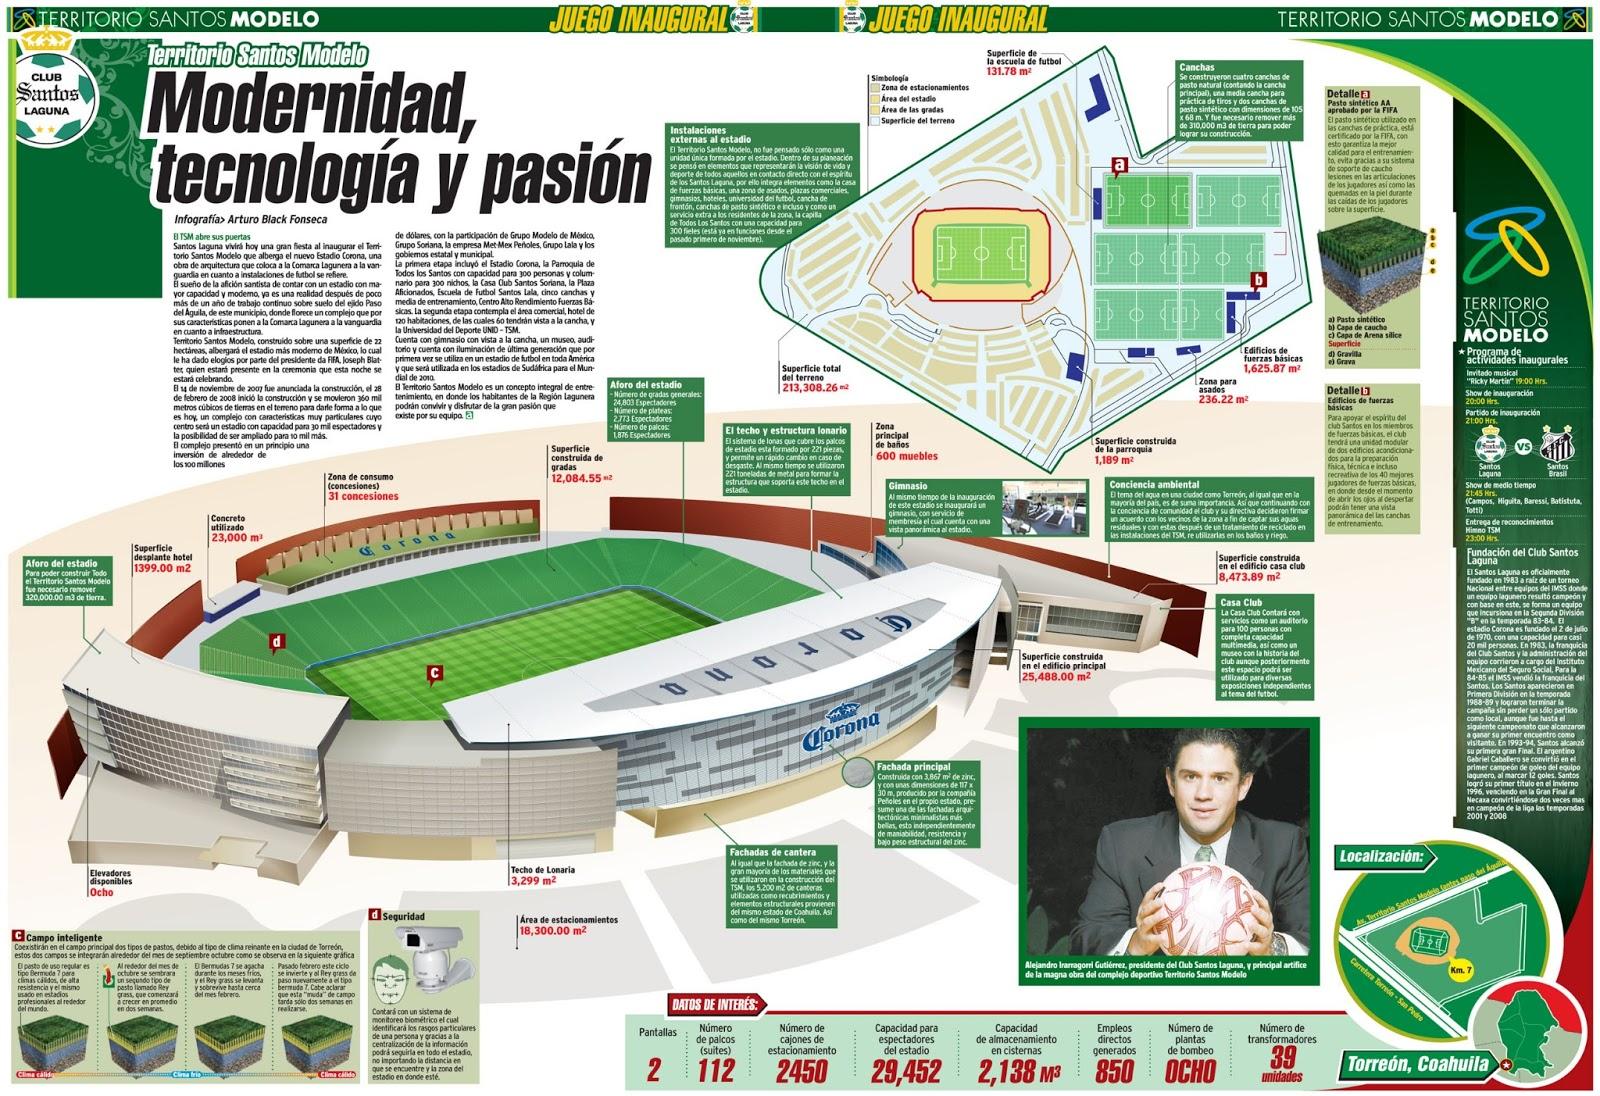 ANOTANDO FÚTBOL *: SANTOS LAGUNA * PARTE 1 Felipe Calderon